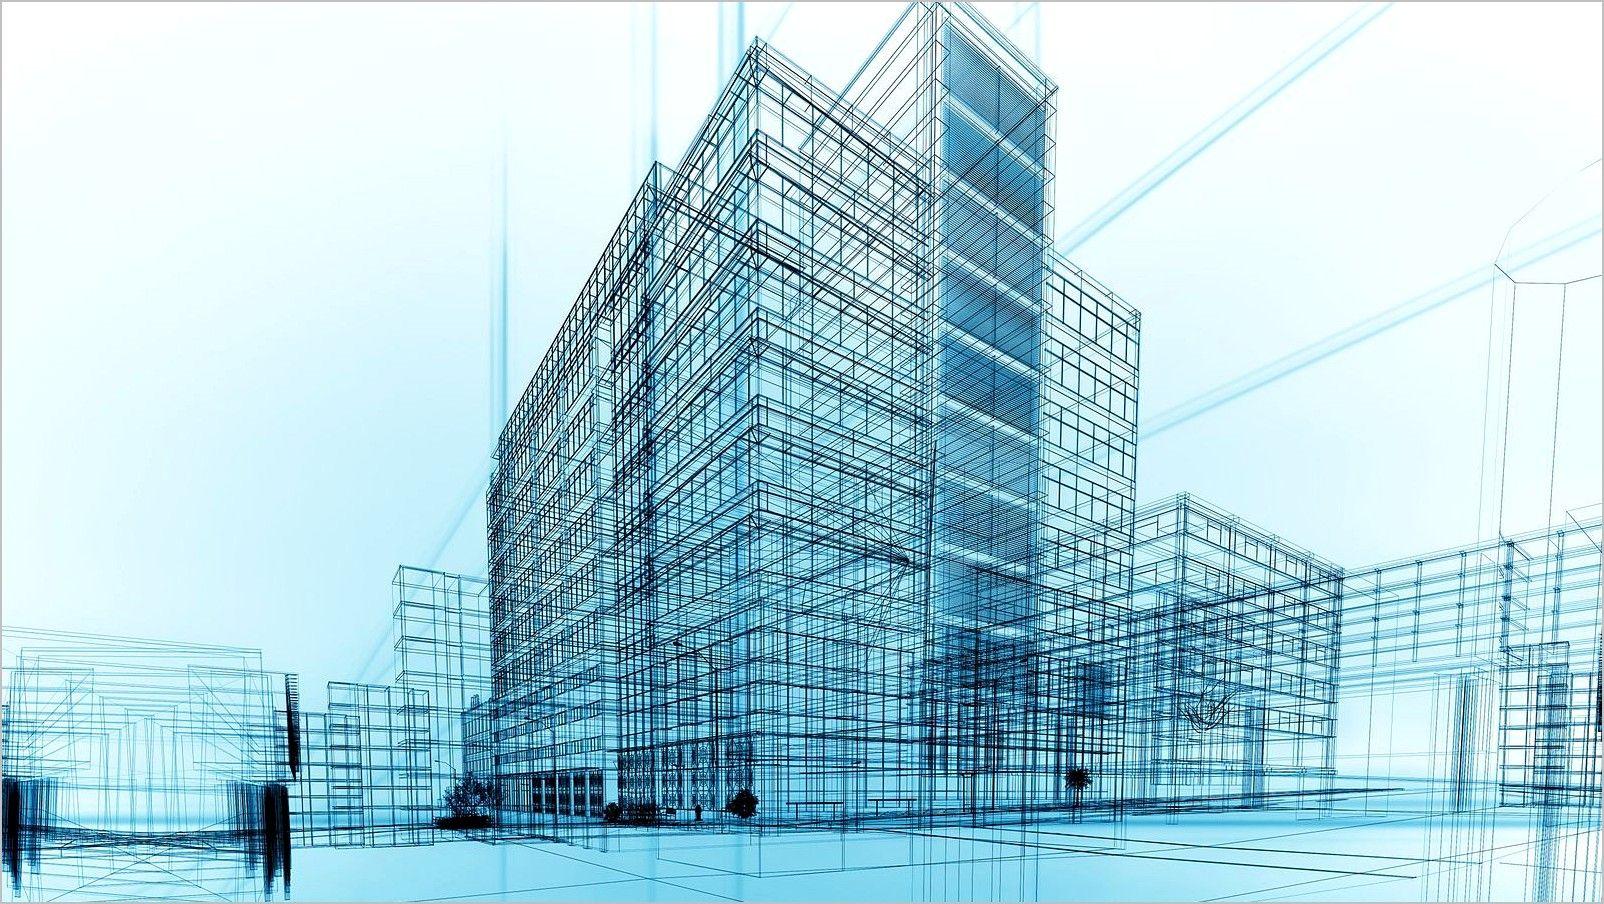 Civil Engineering Wallpaper 4k Architecture Jobs 3d Architectural Rendering Architecture Drawing 1080p civil engineering hd wallpapers